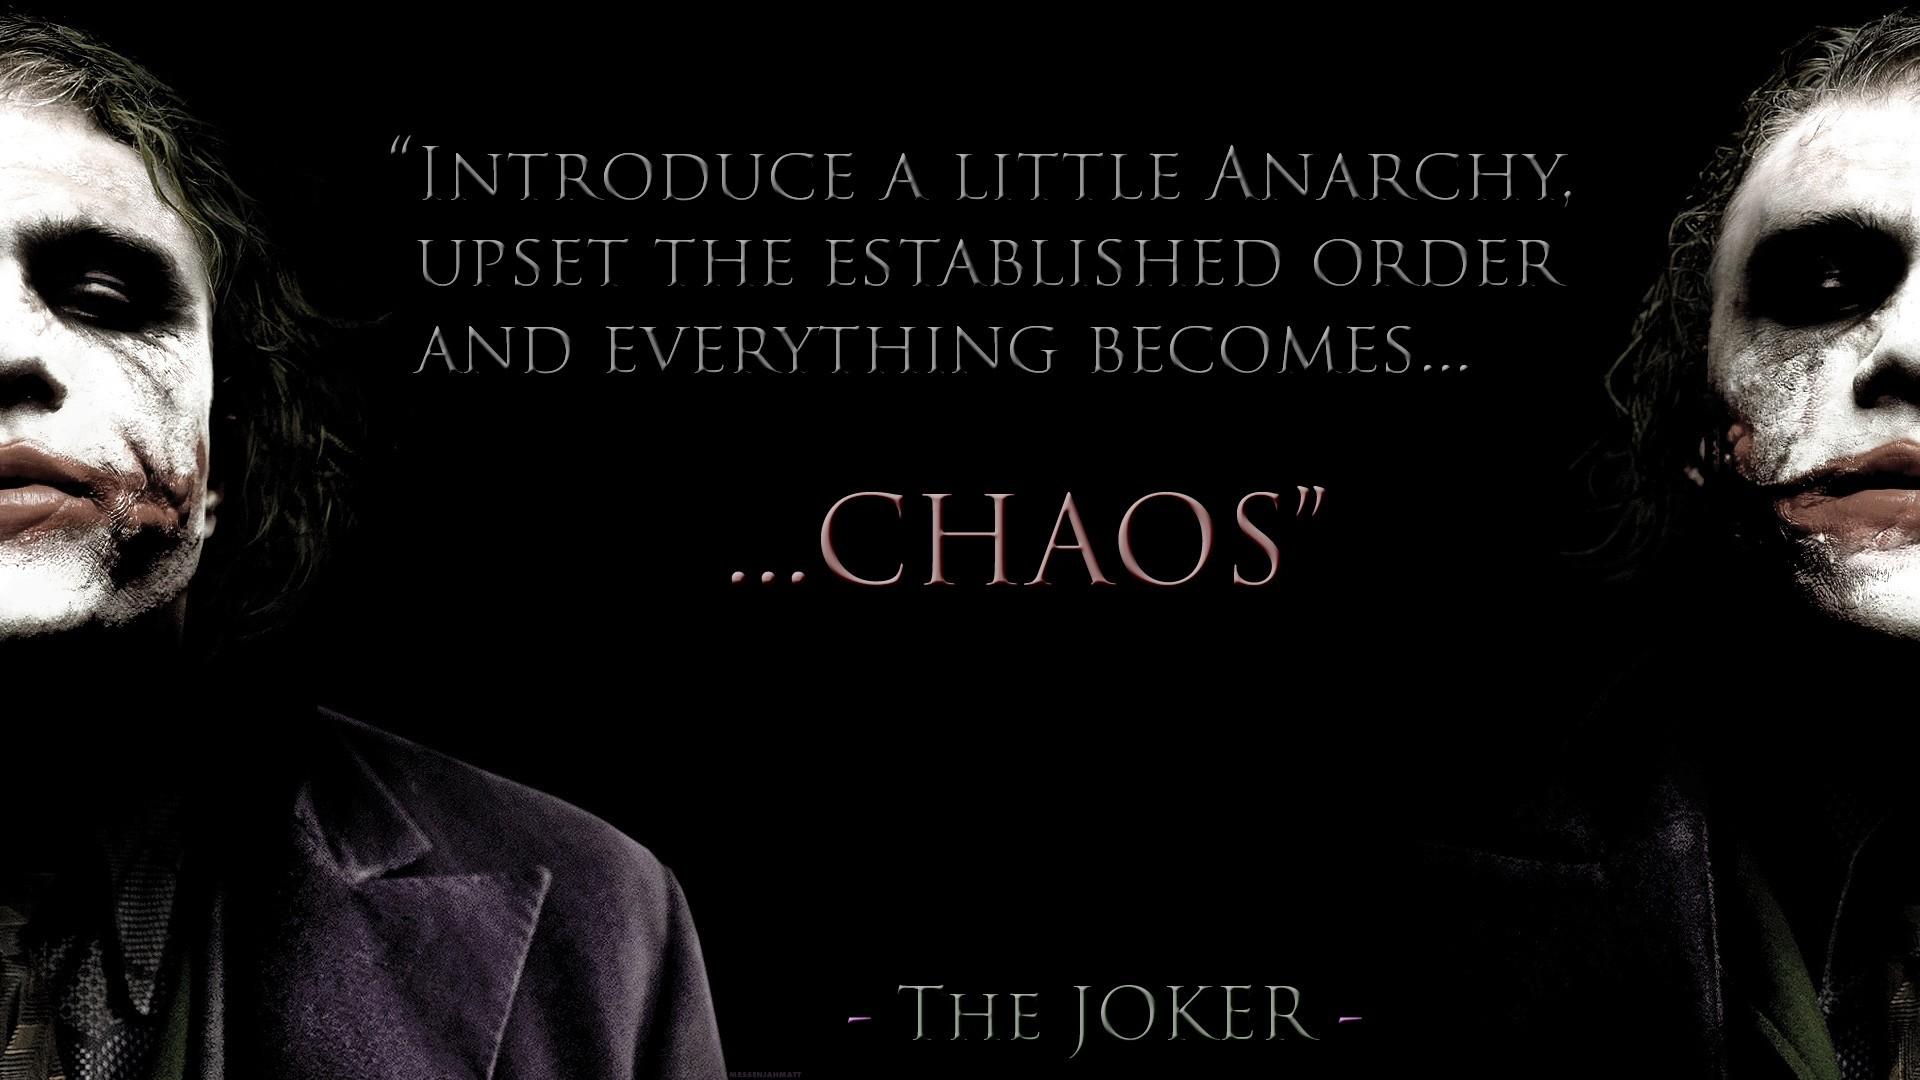 Batman Dark Knight Joker Quotes. QuotesGram Quotes About Falling Apart